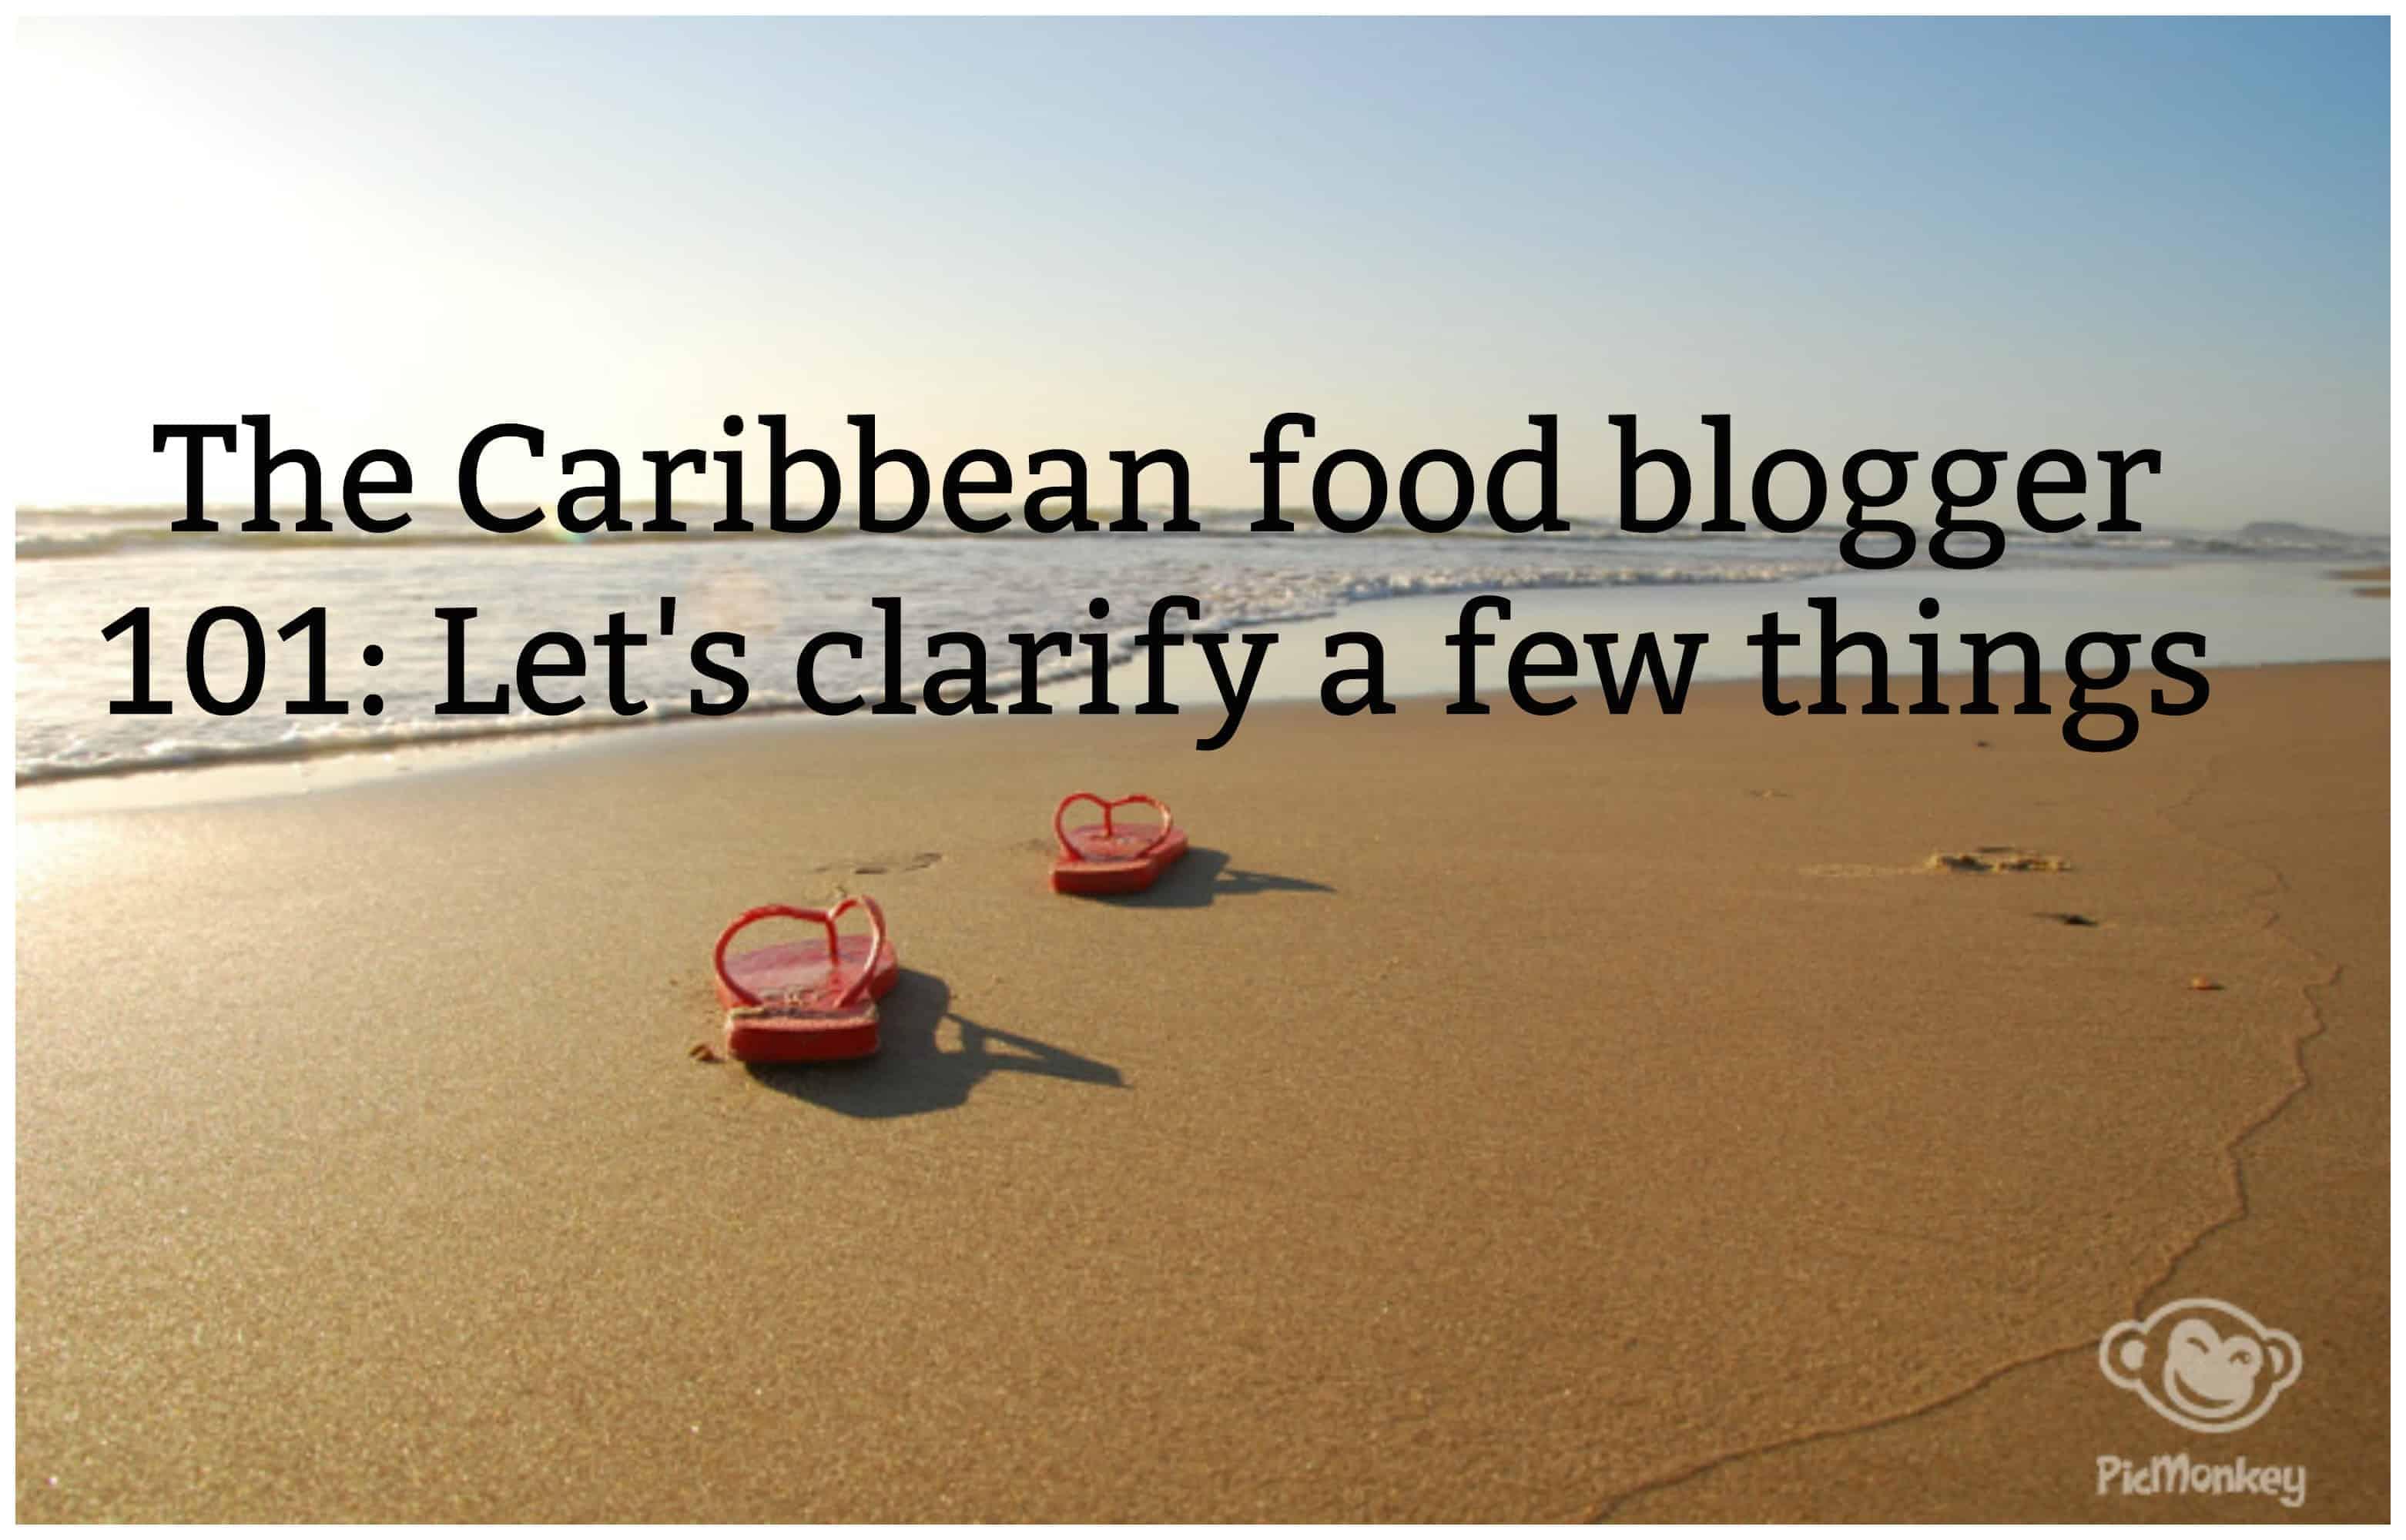 Caribbean food blogger 101